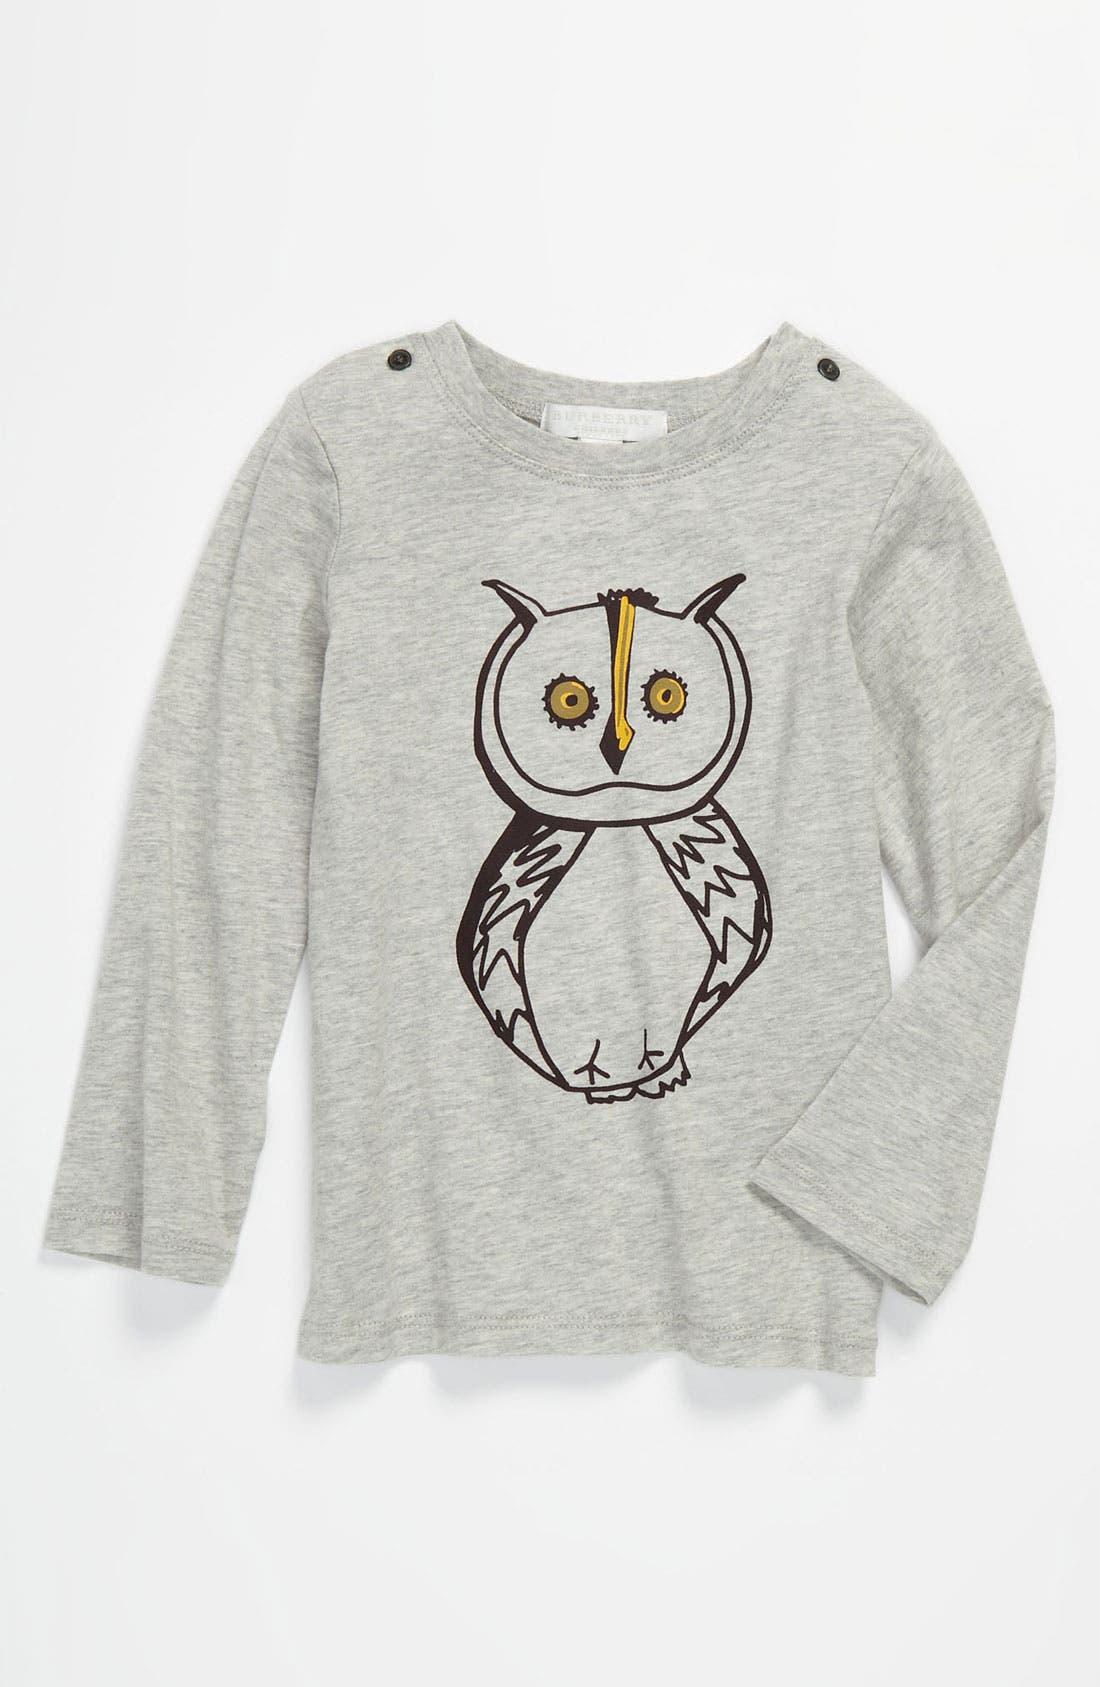 Main Image - Burberry Owl Print Tee (Infant)